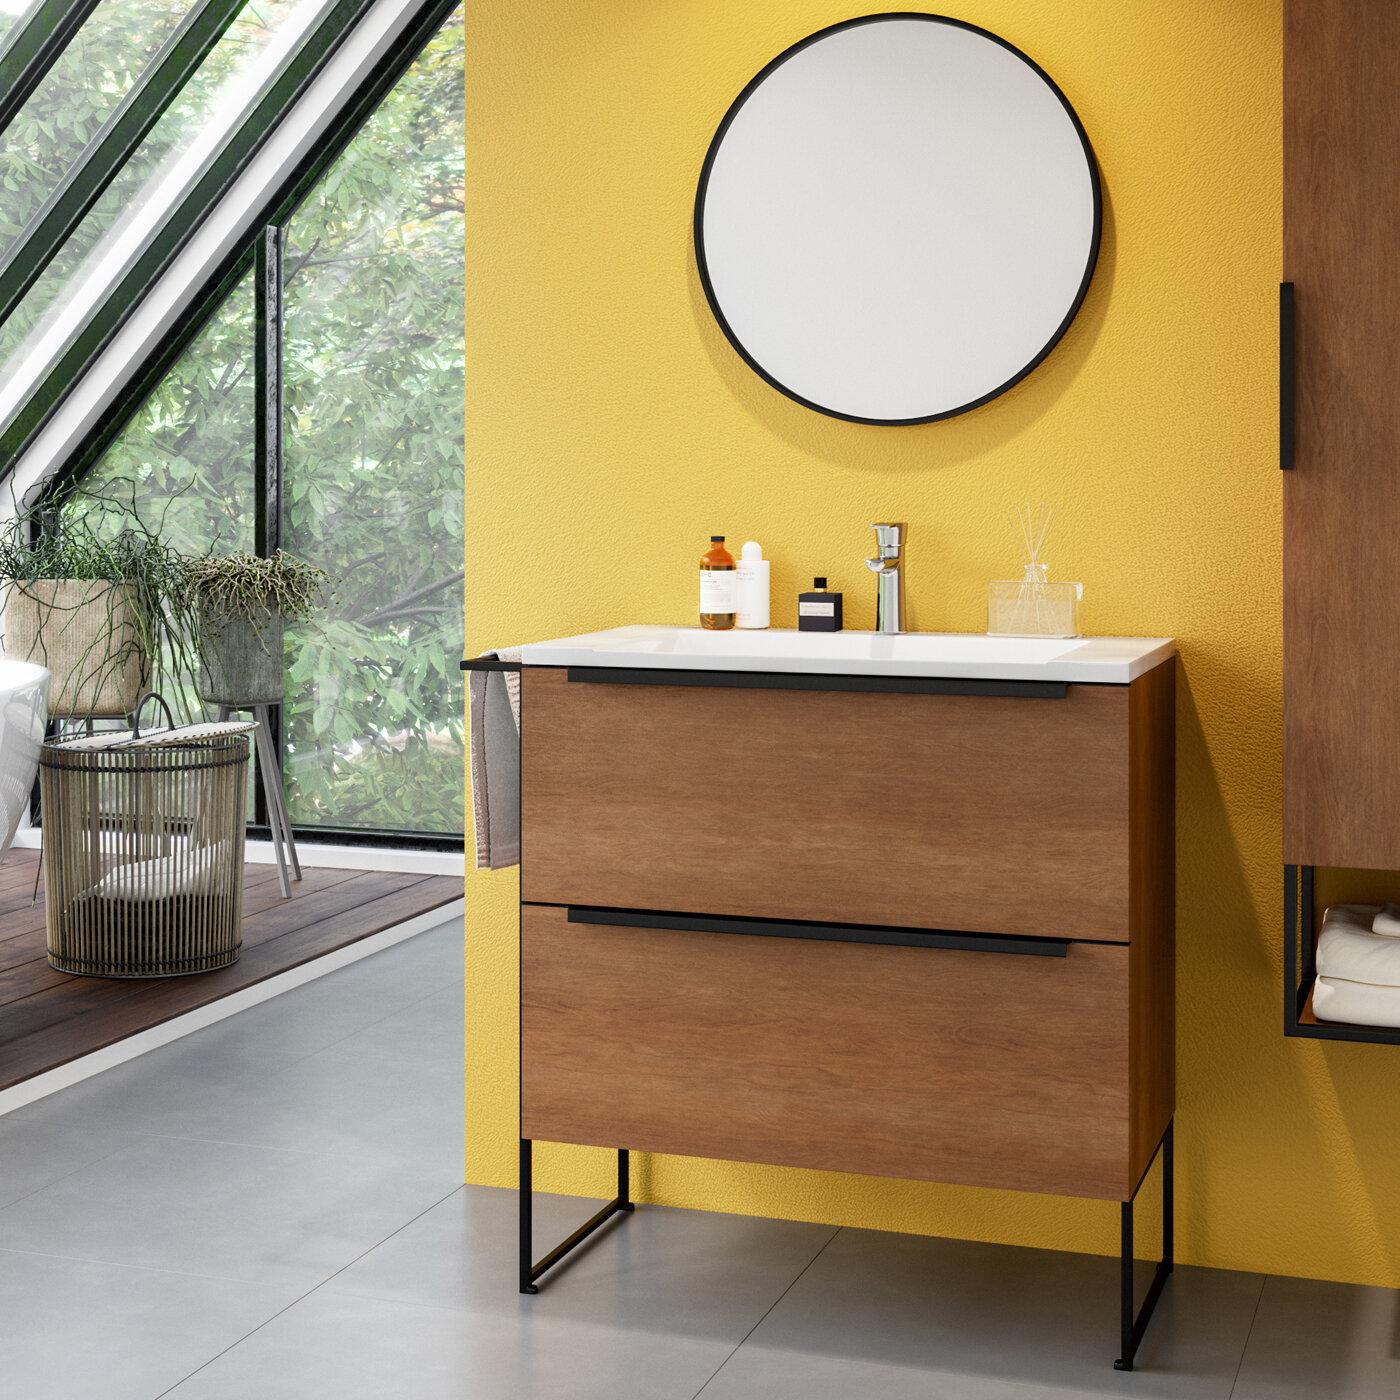 Belfry Bathroom Corington 800mm Free Standing Single Vanity Unit Wayfair Co Uk